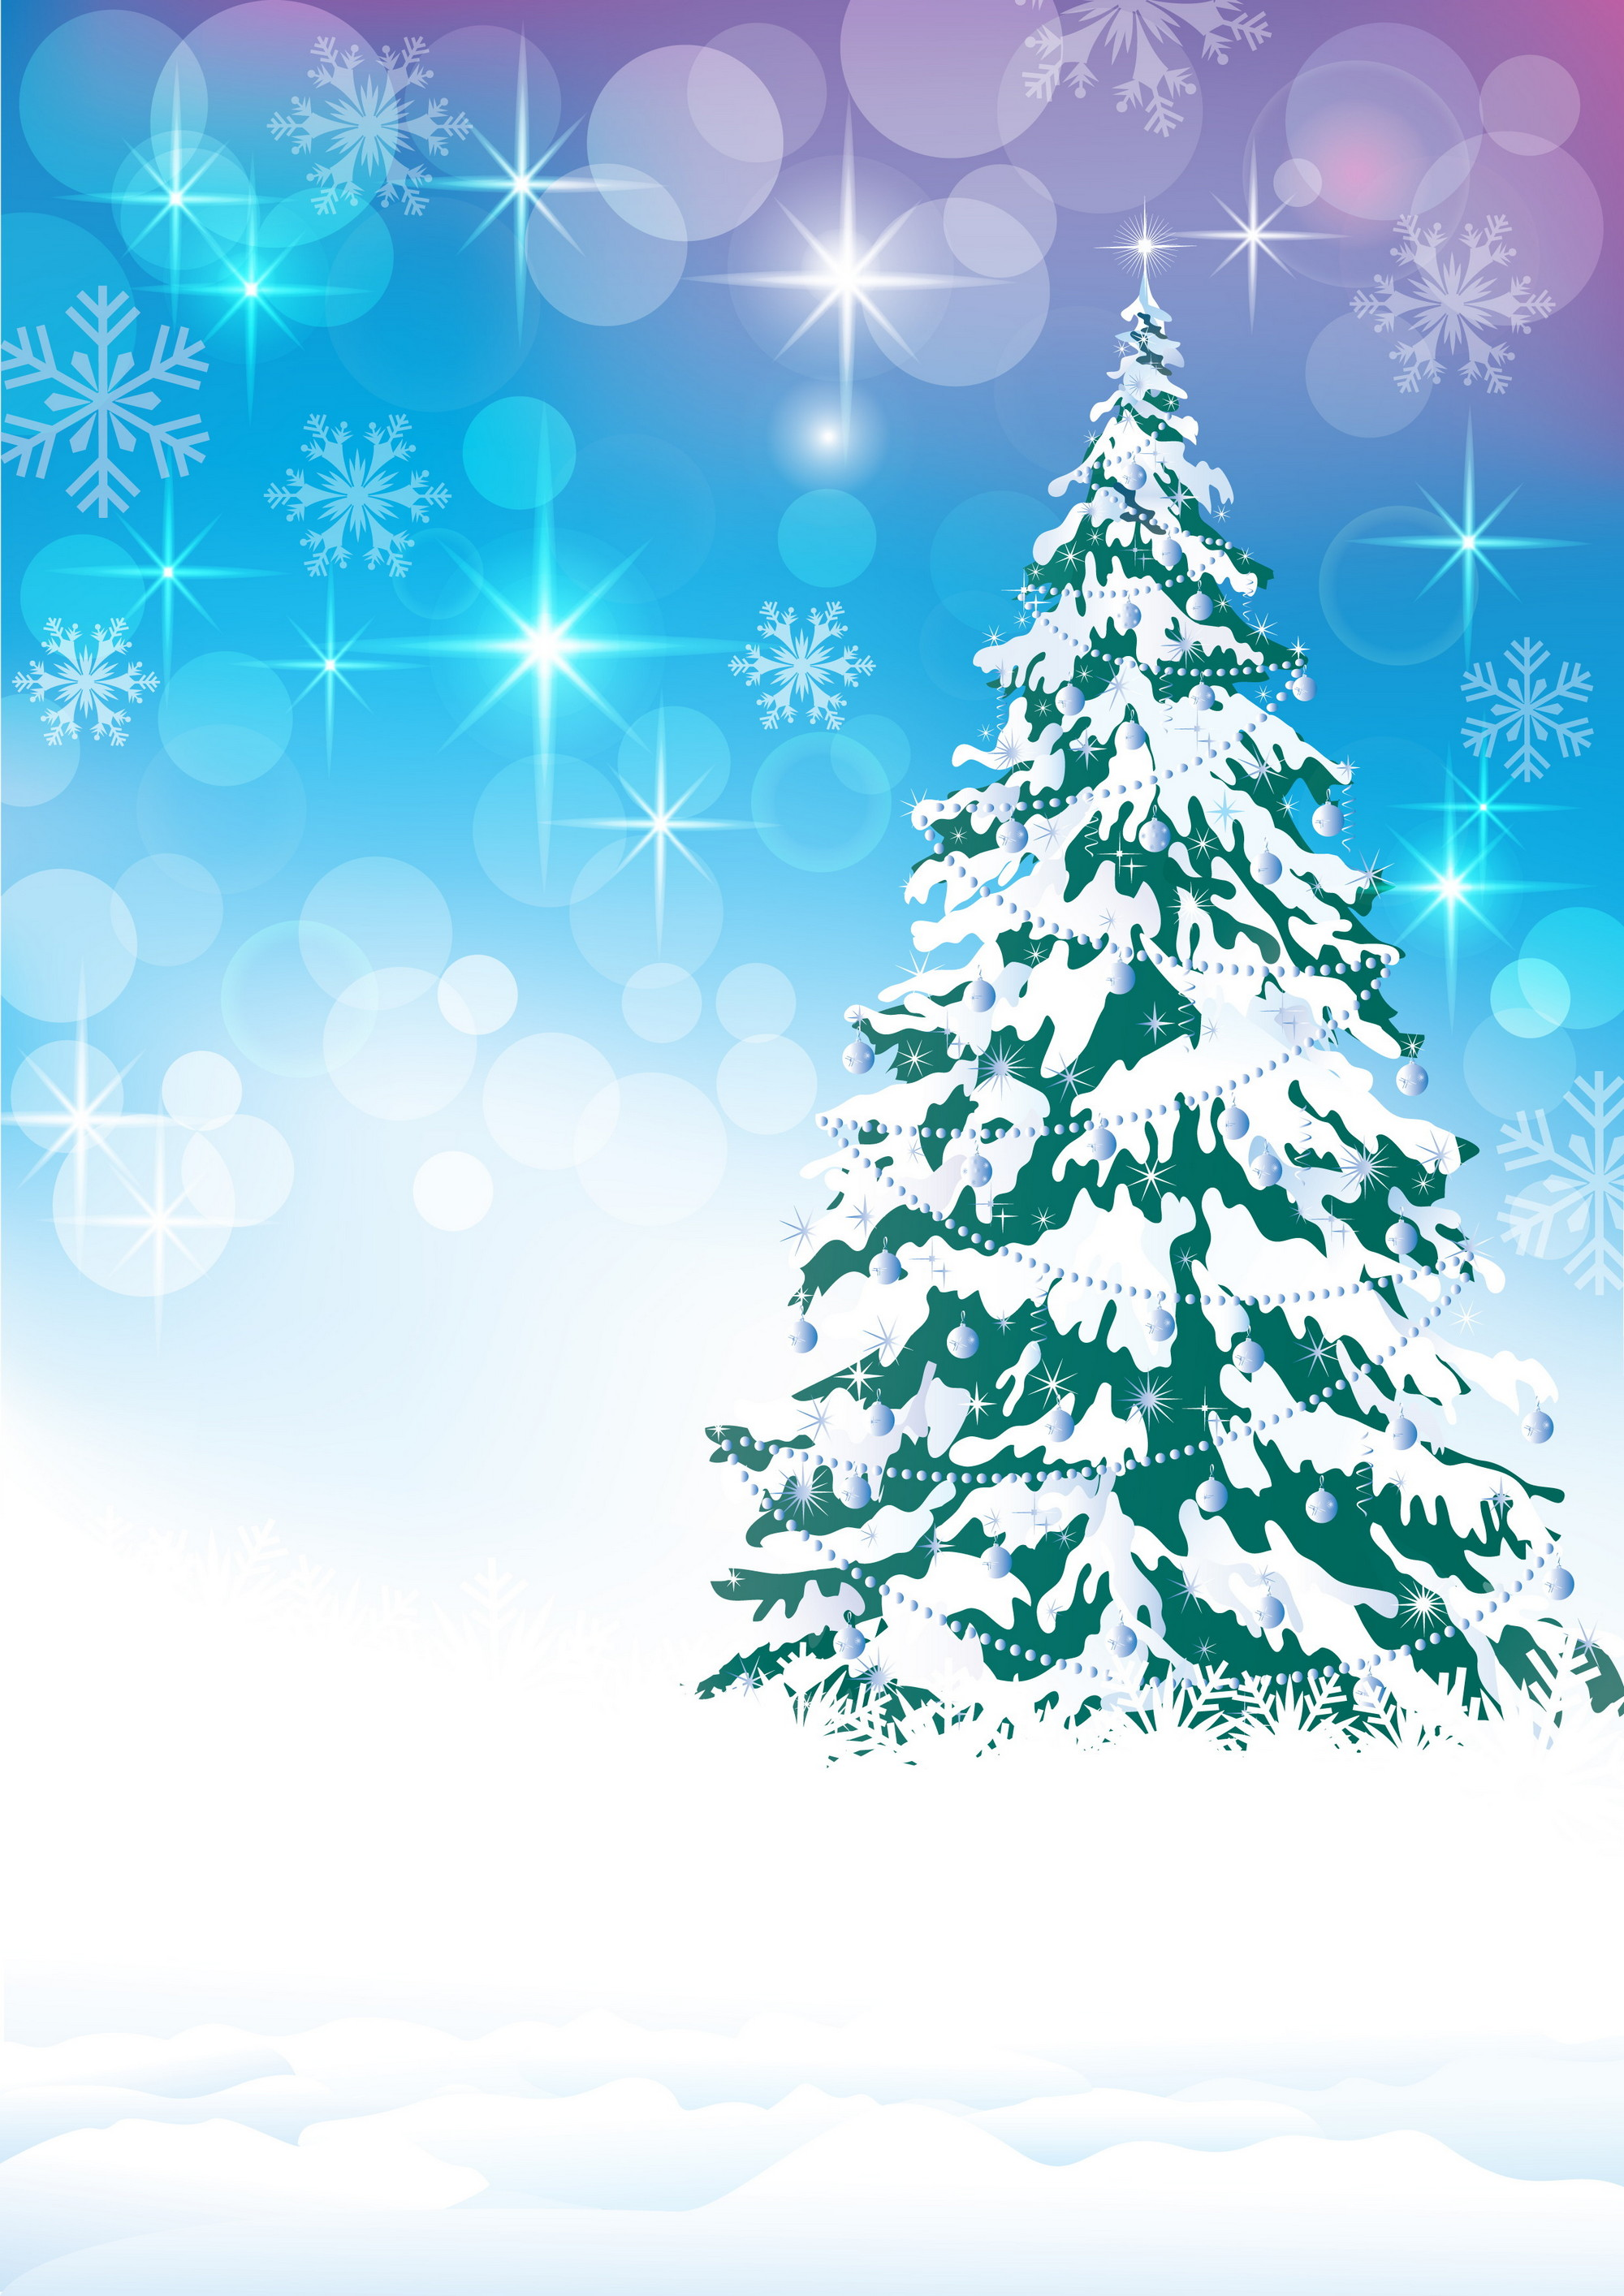 открытки со снежинками и елками экспорт